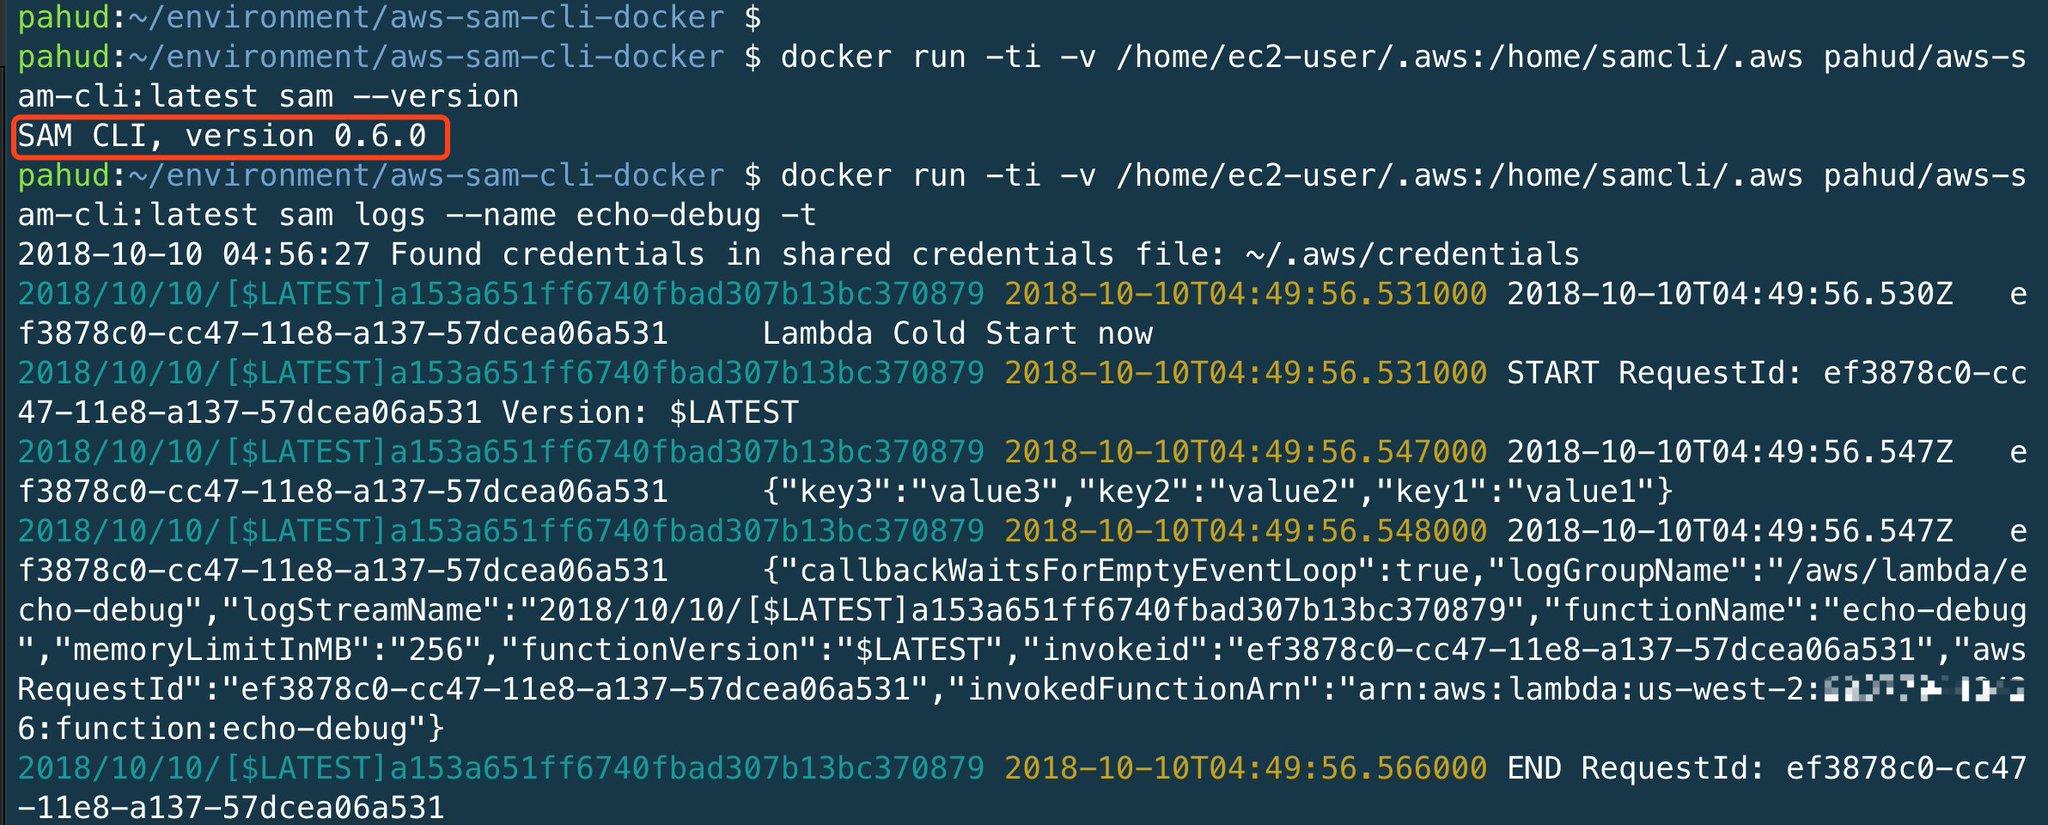 GitHub - pahud/sam-cli-docker: Docker image for AWS SAM CLI